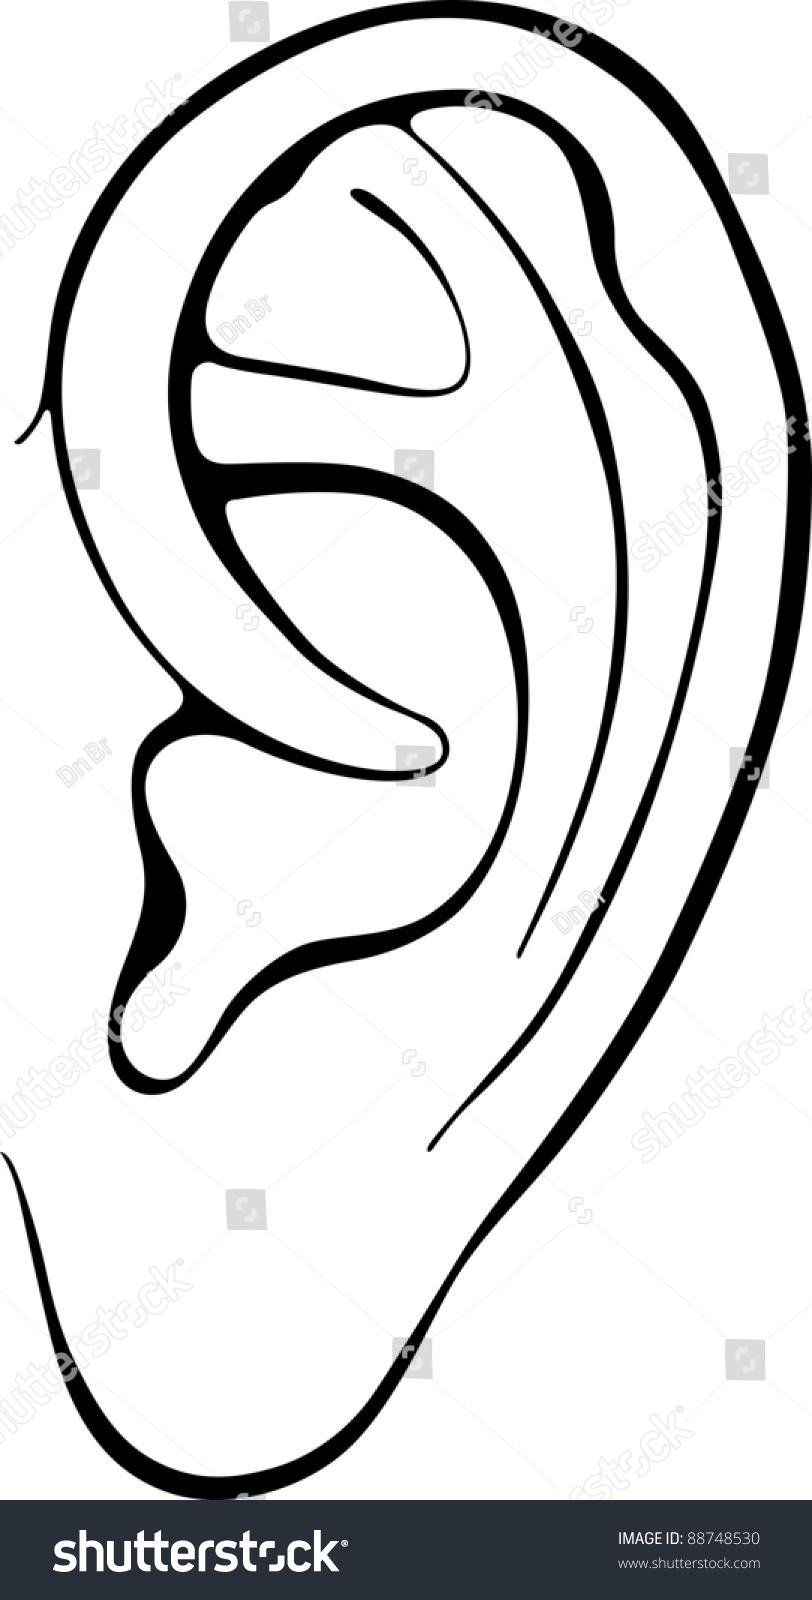 Human Ear Stock Vector Illustration 88748530 : Shutterstock